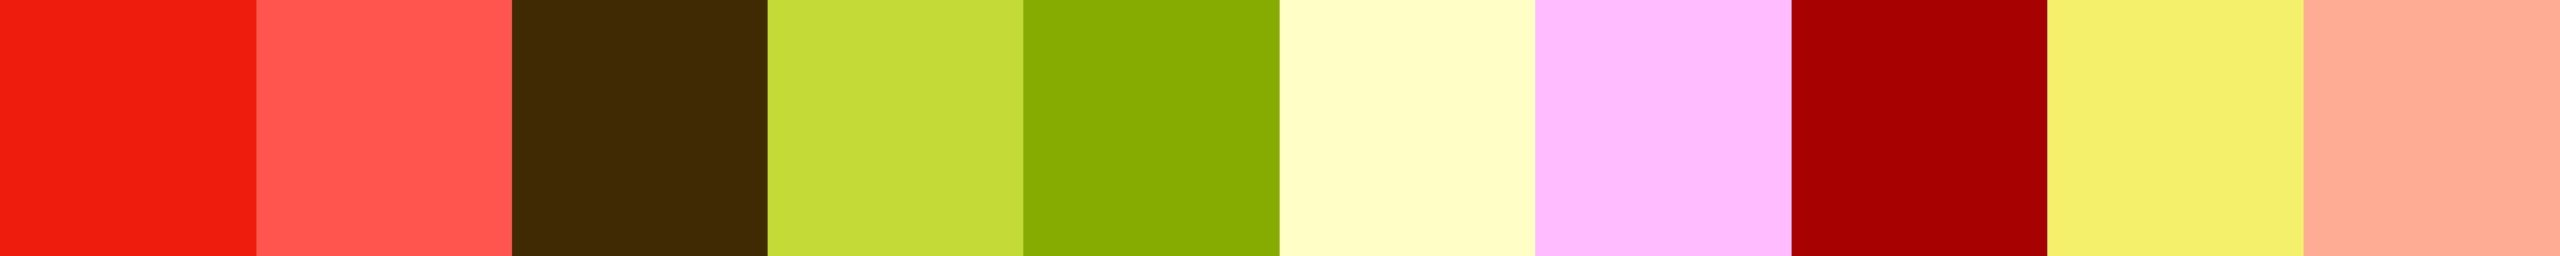 416 Akrasa Color Palette